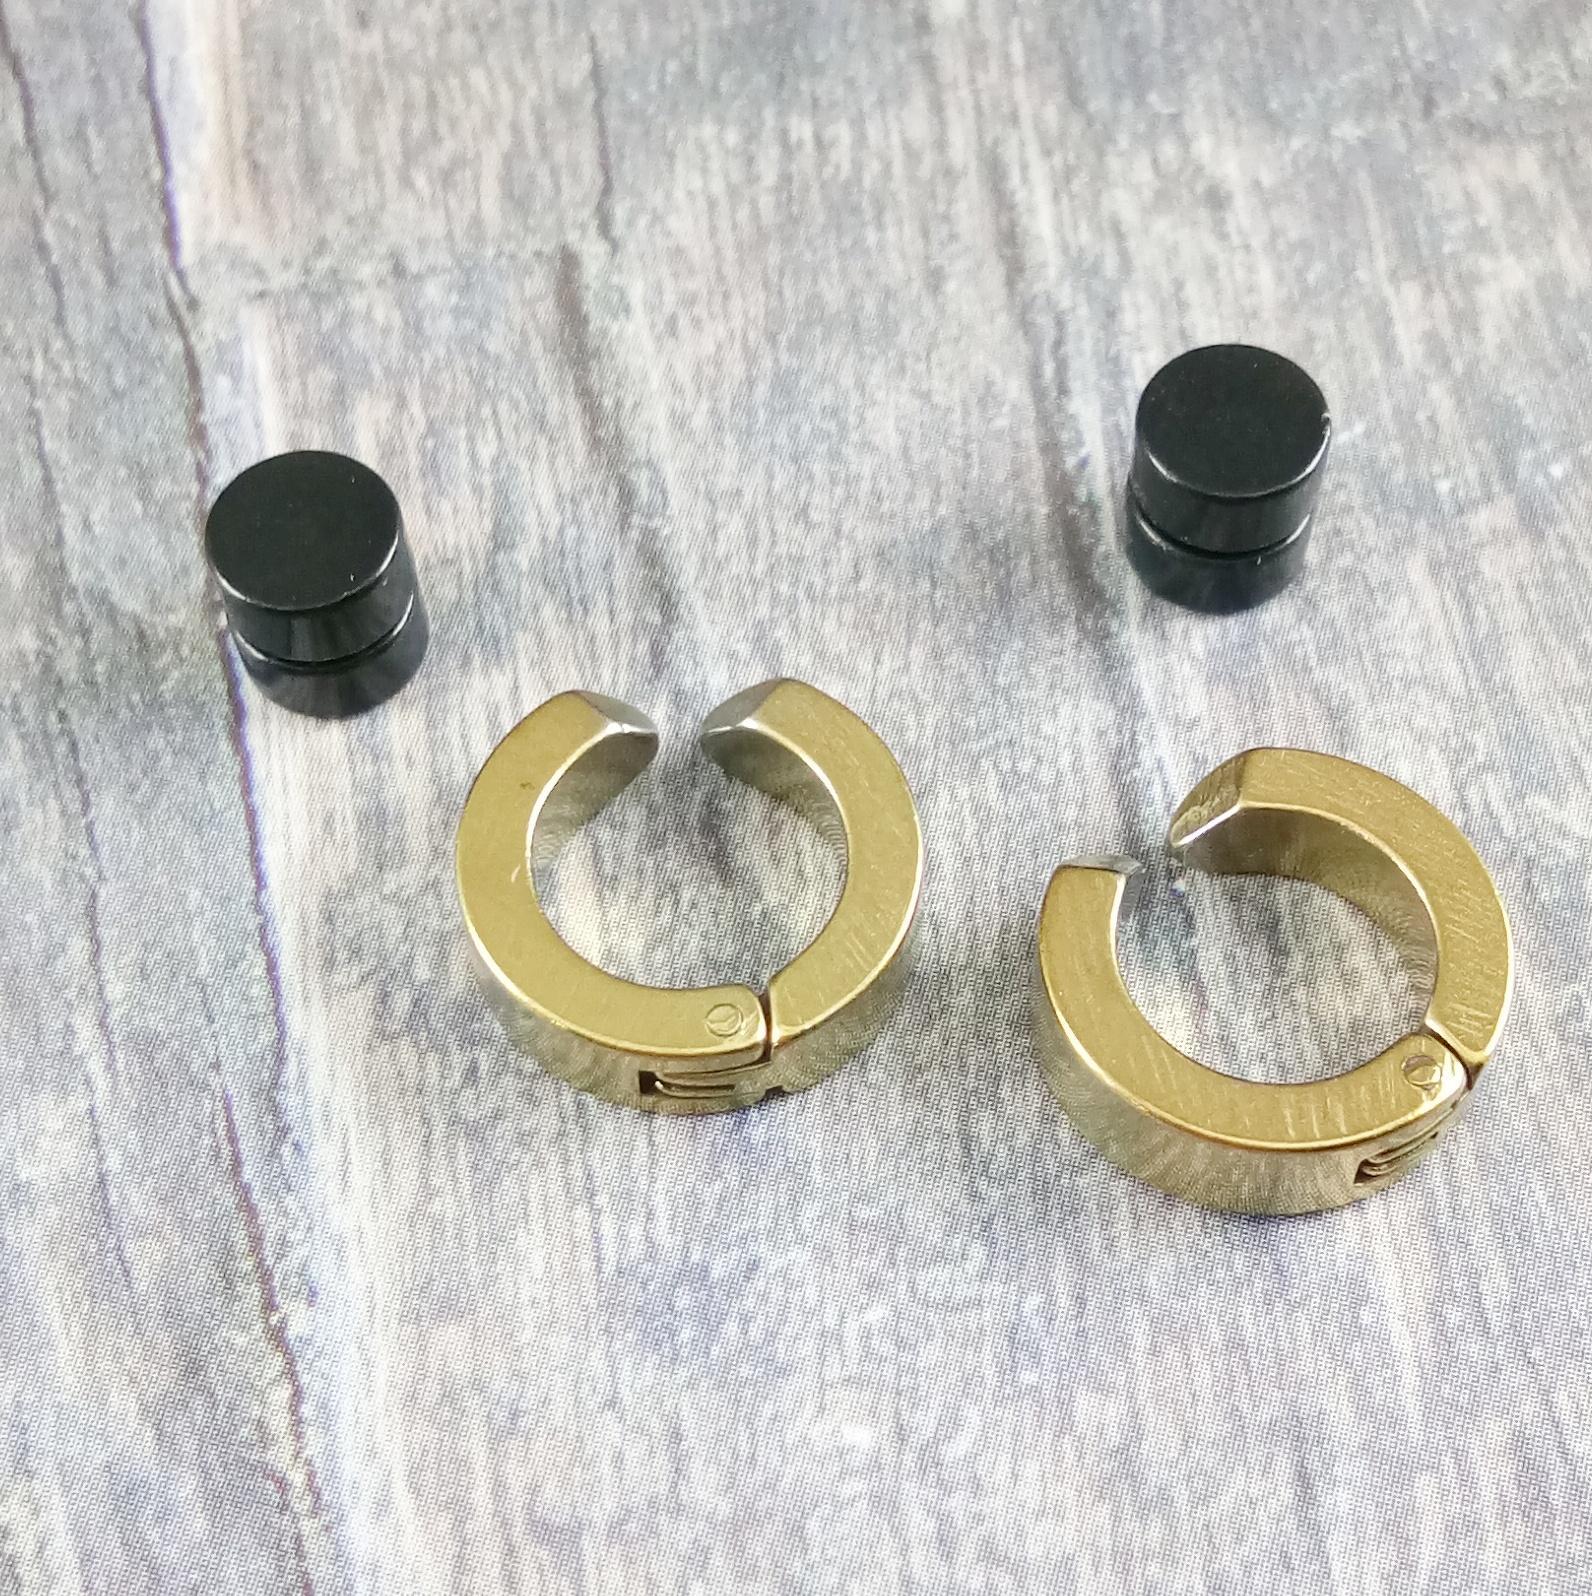 Anneui Paket Promo Anting Magnet - Hitam - 2 Pcs + BP0013 Anting Jepit - 2 pcs